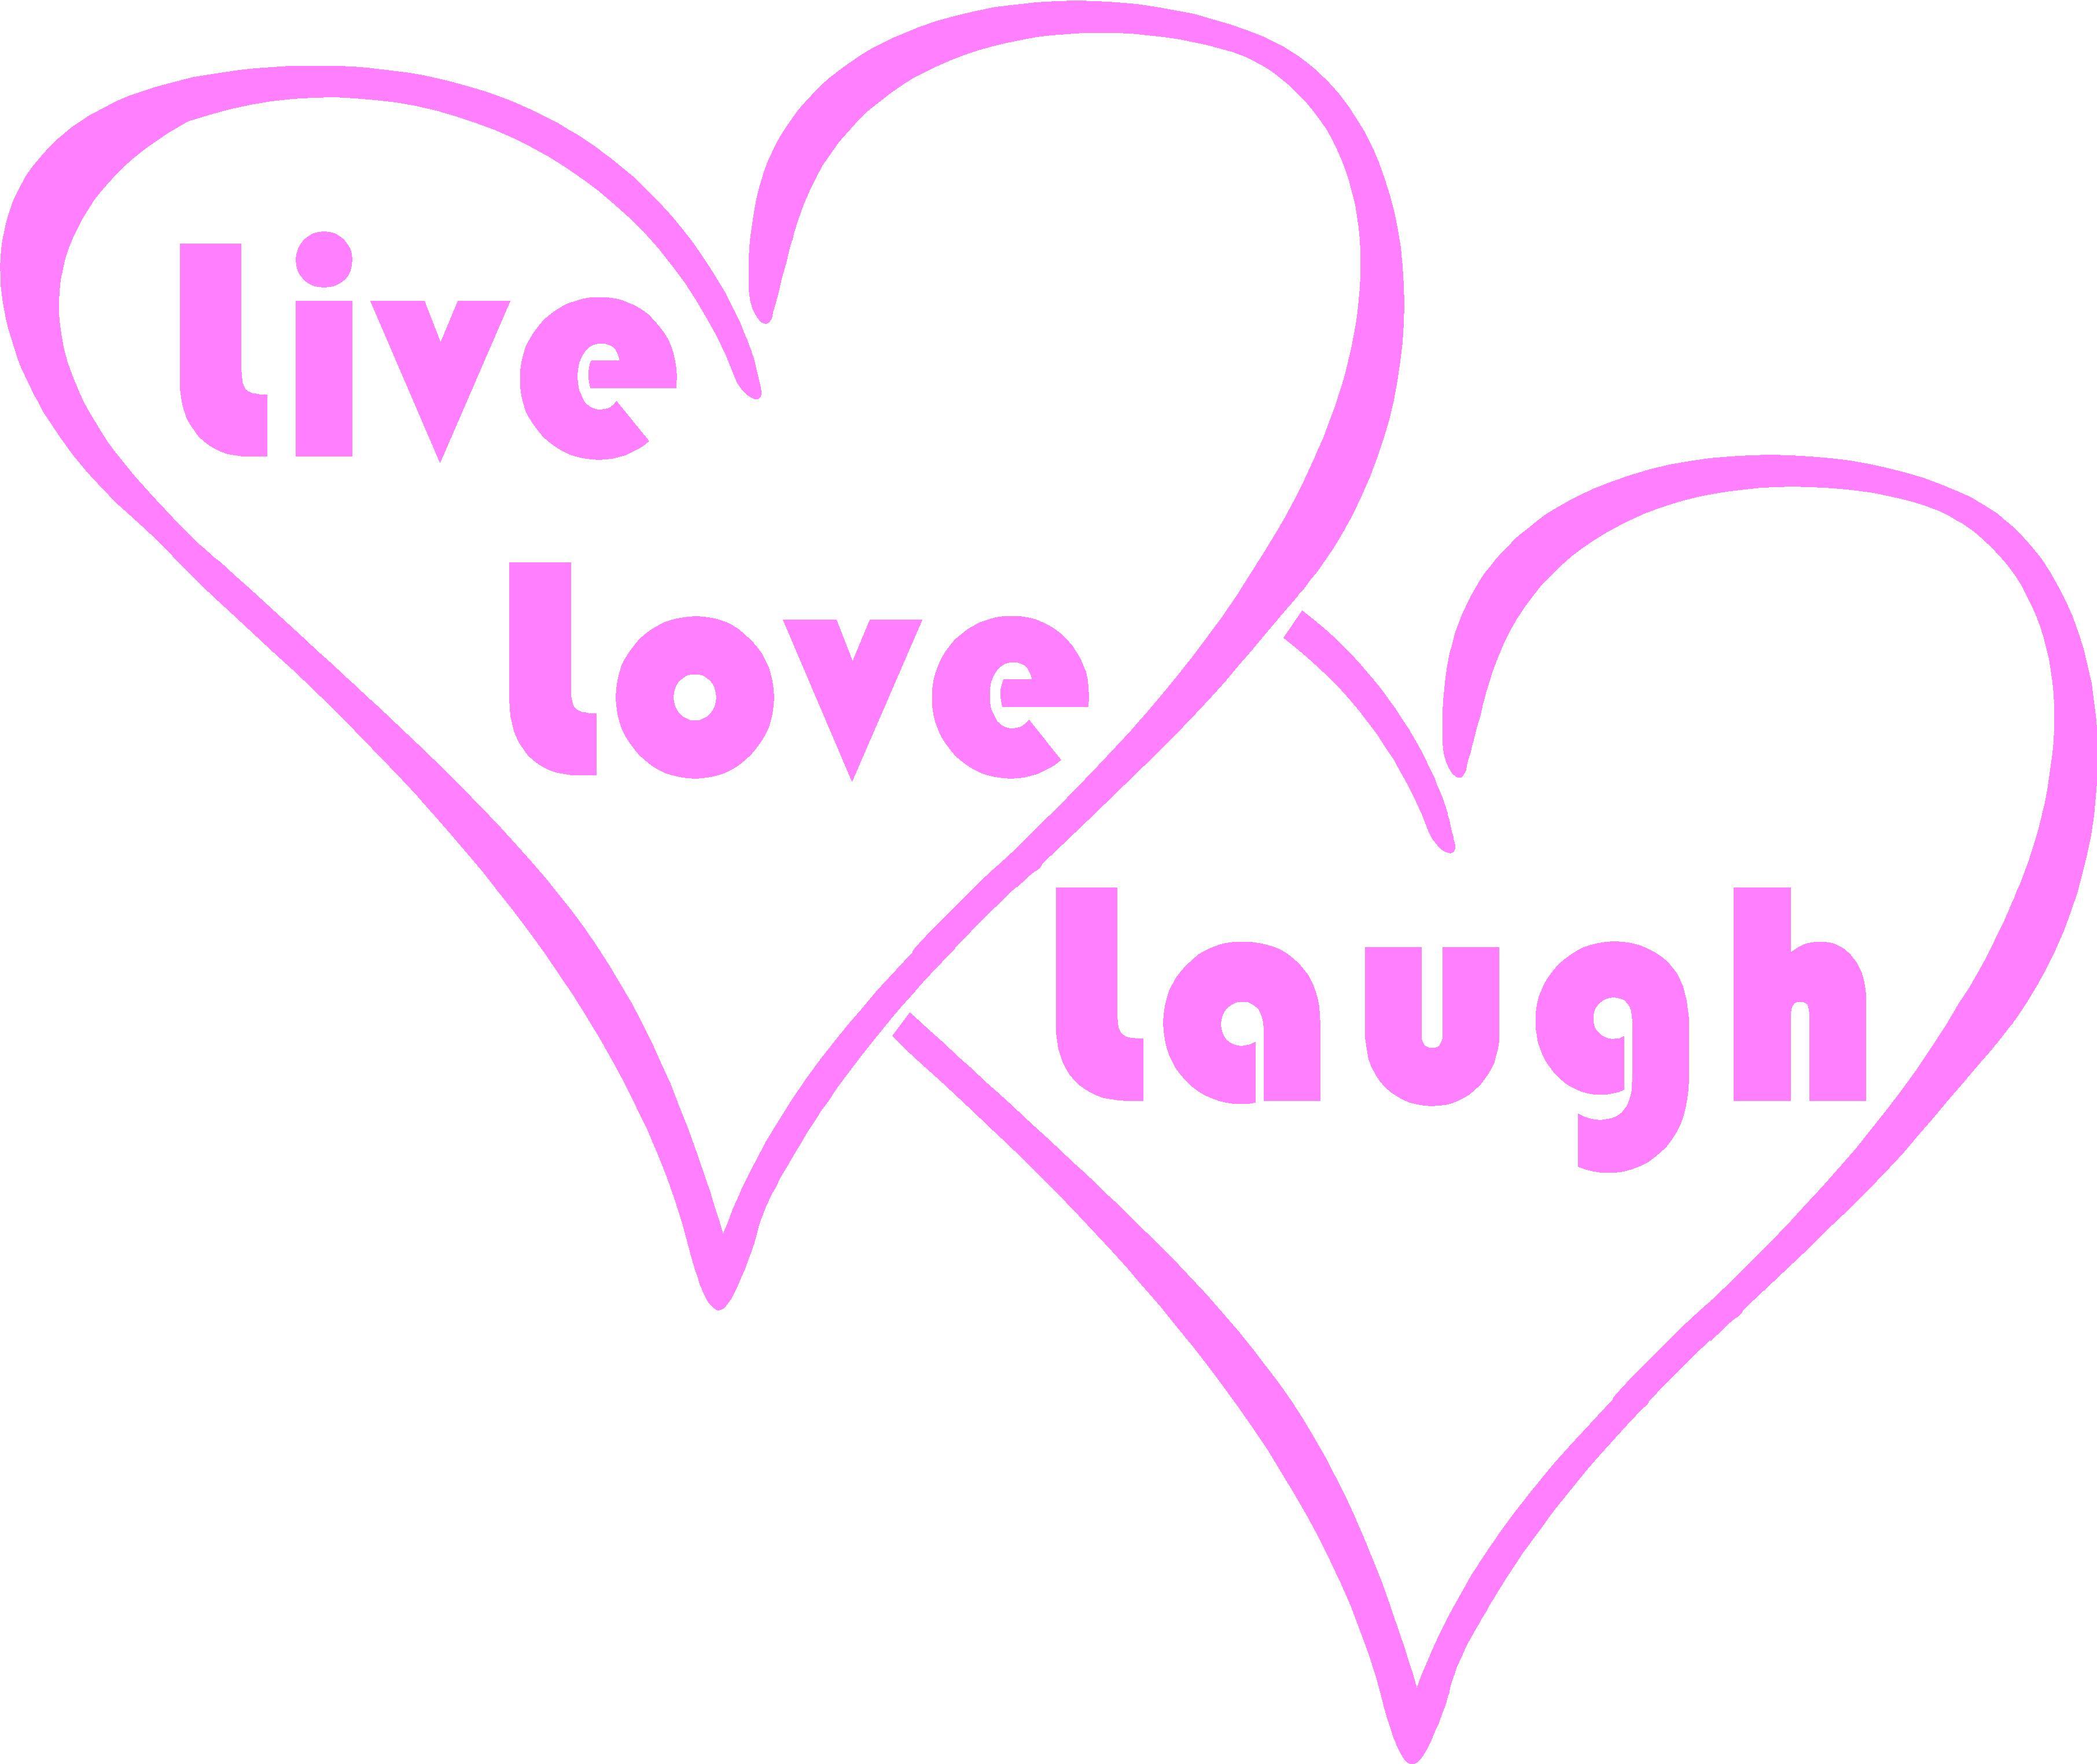 6x5 inches LIve Love Laugh $3.00